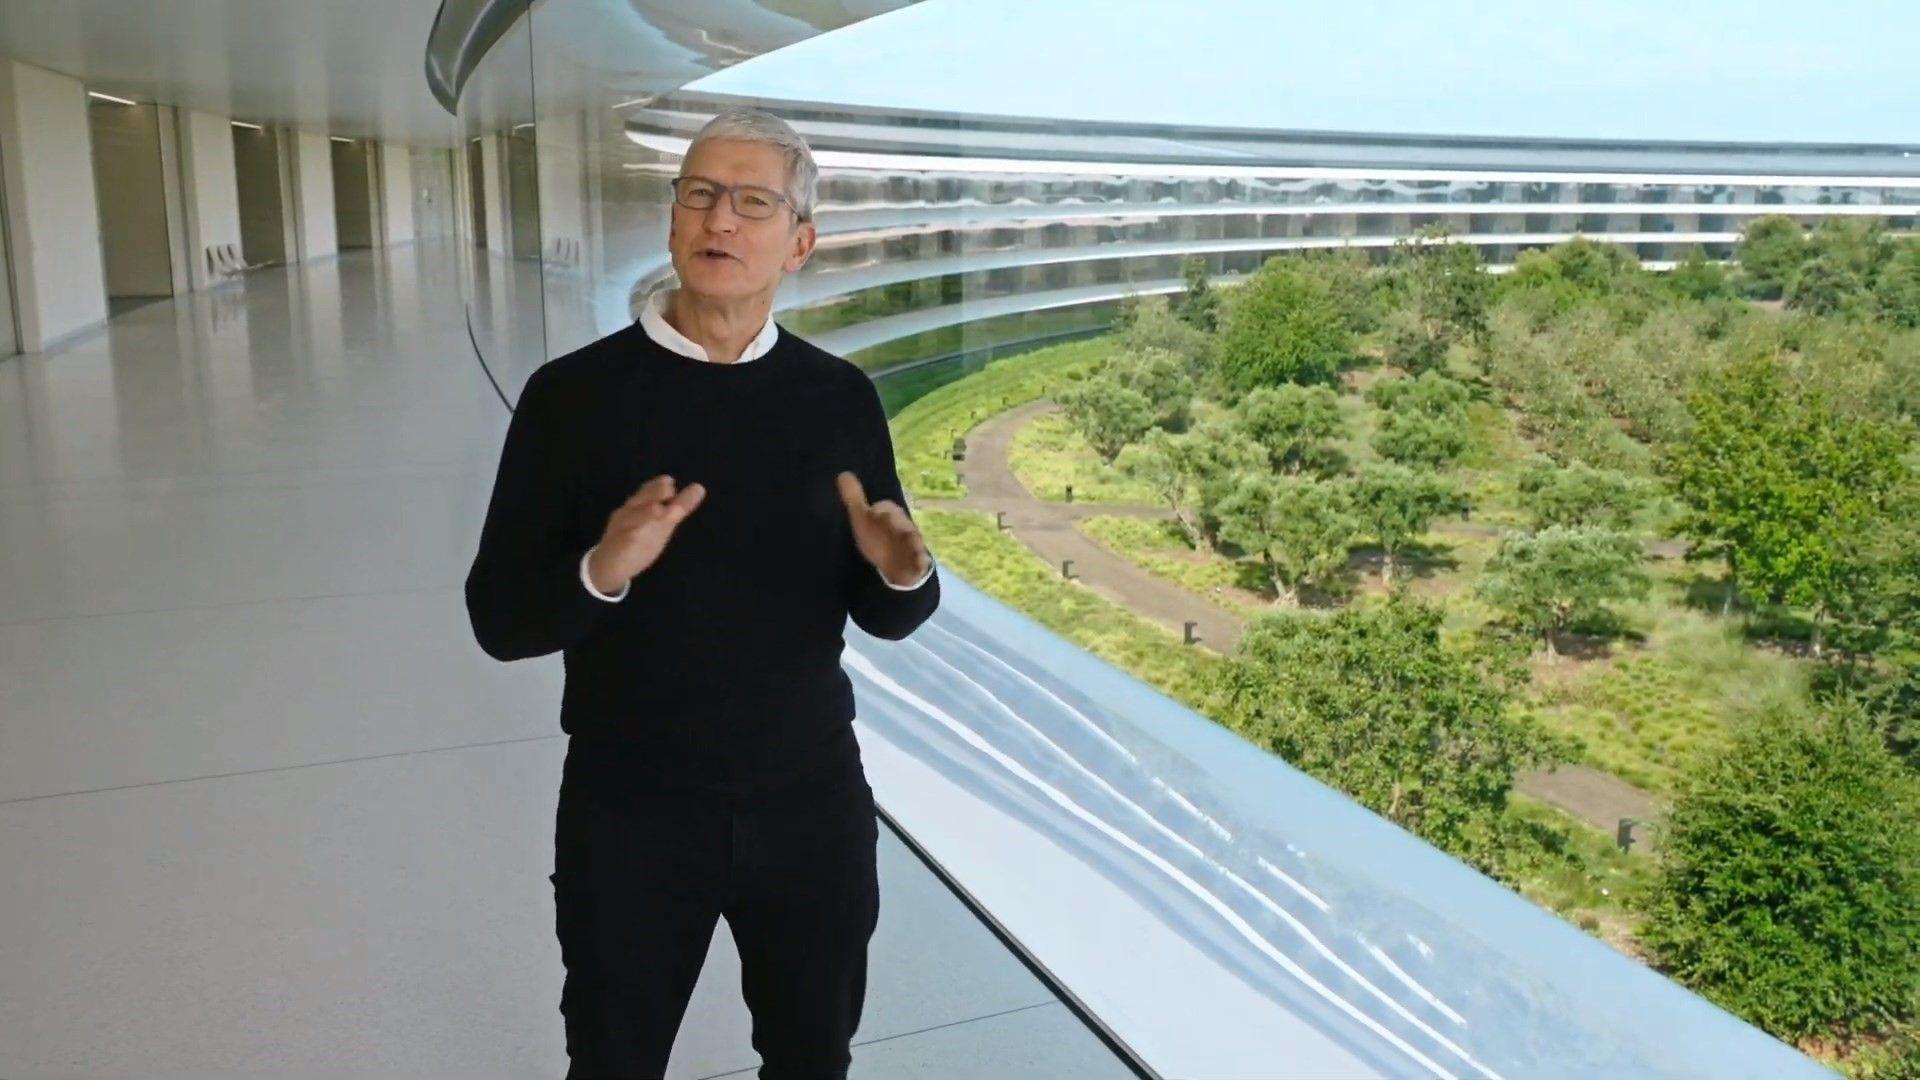 مؤتمر Apple 2020 يعلن عن مميزات واسعار ابل واتش 6 وساعة رخيصة ايباد اير 4 وموعد ايفون 12 New Iphone Iphone Event Workout Apps